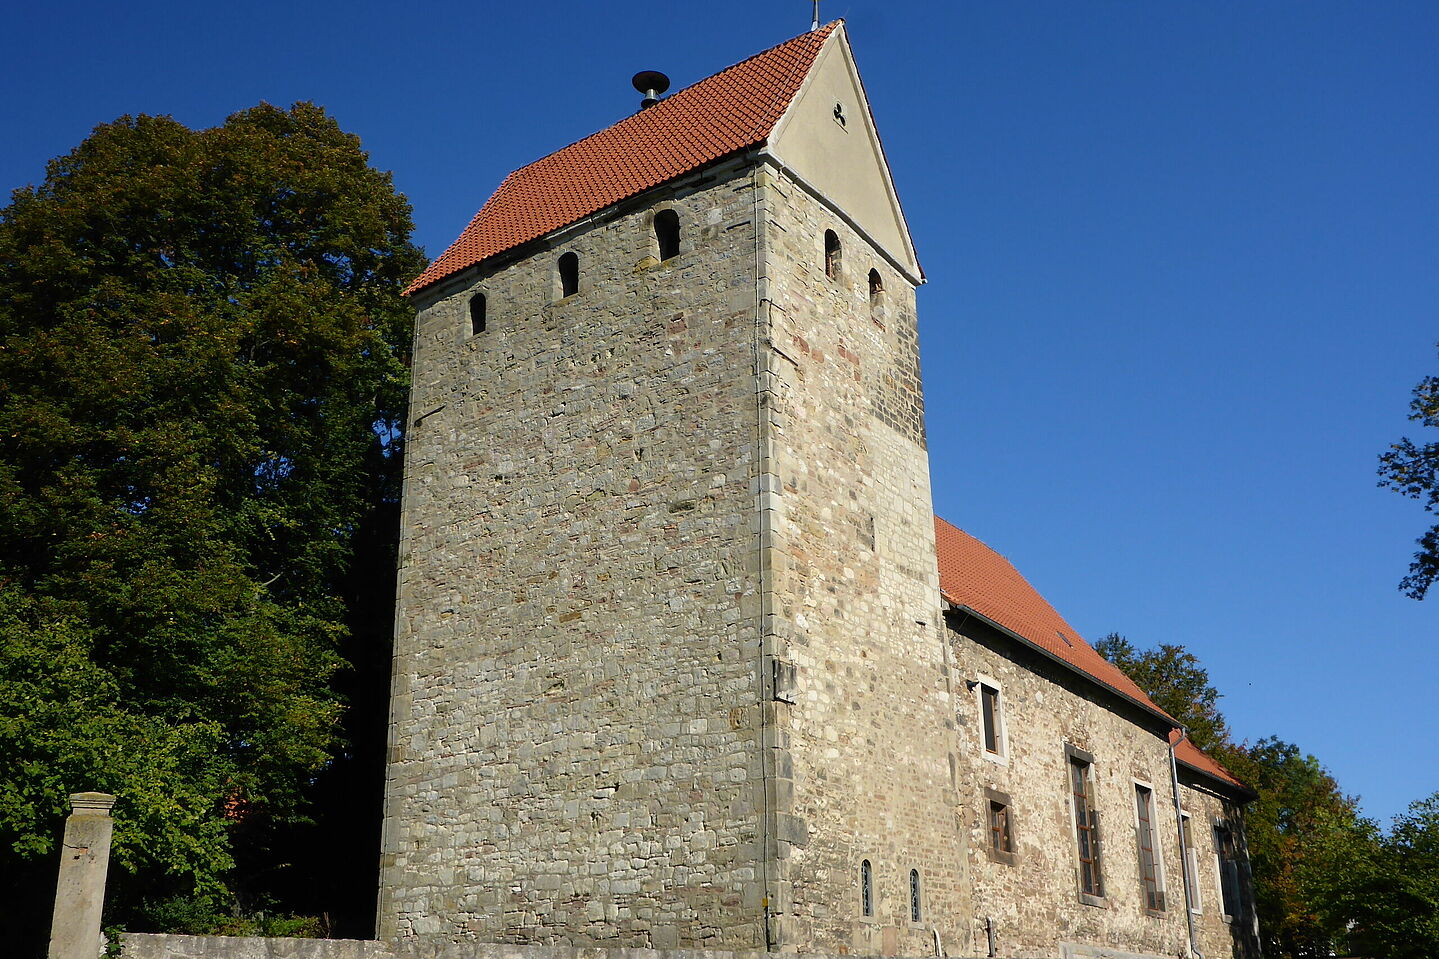 Wöhle Braunschweig